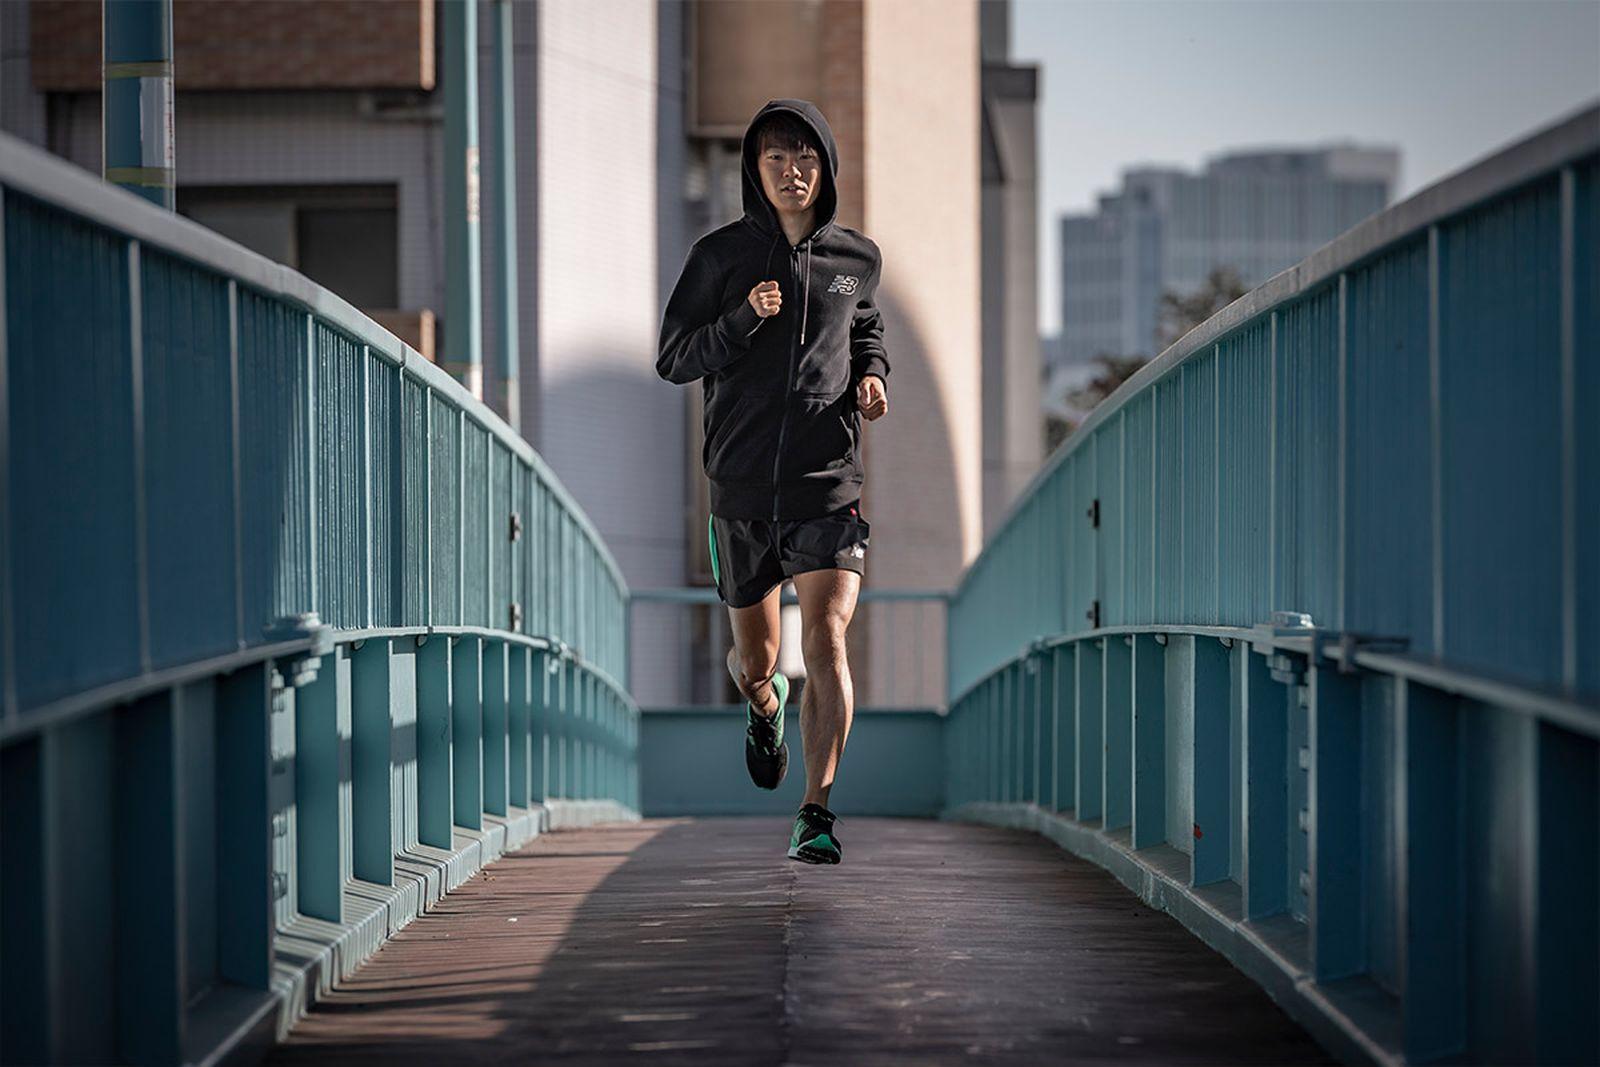 japans next great marathon runner got blessed god shoes08 New Balance running shoes